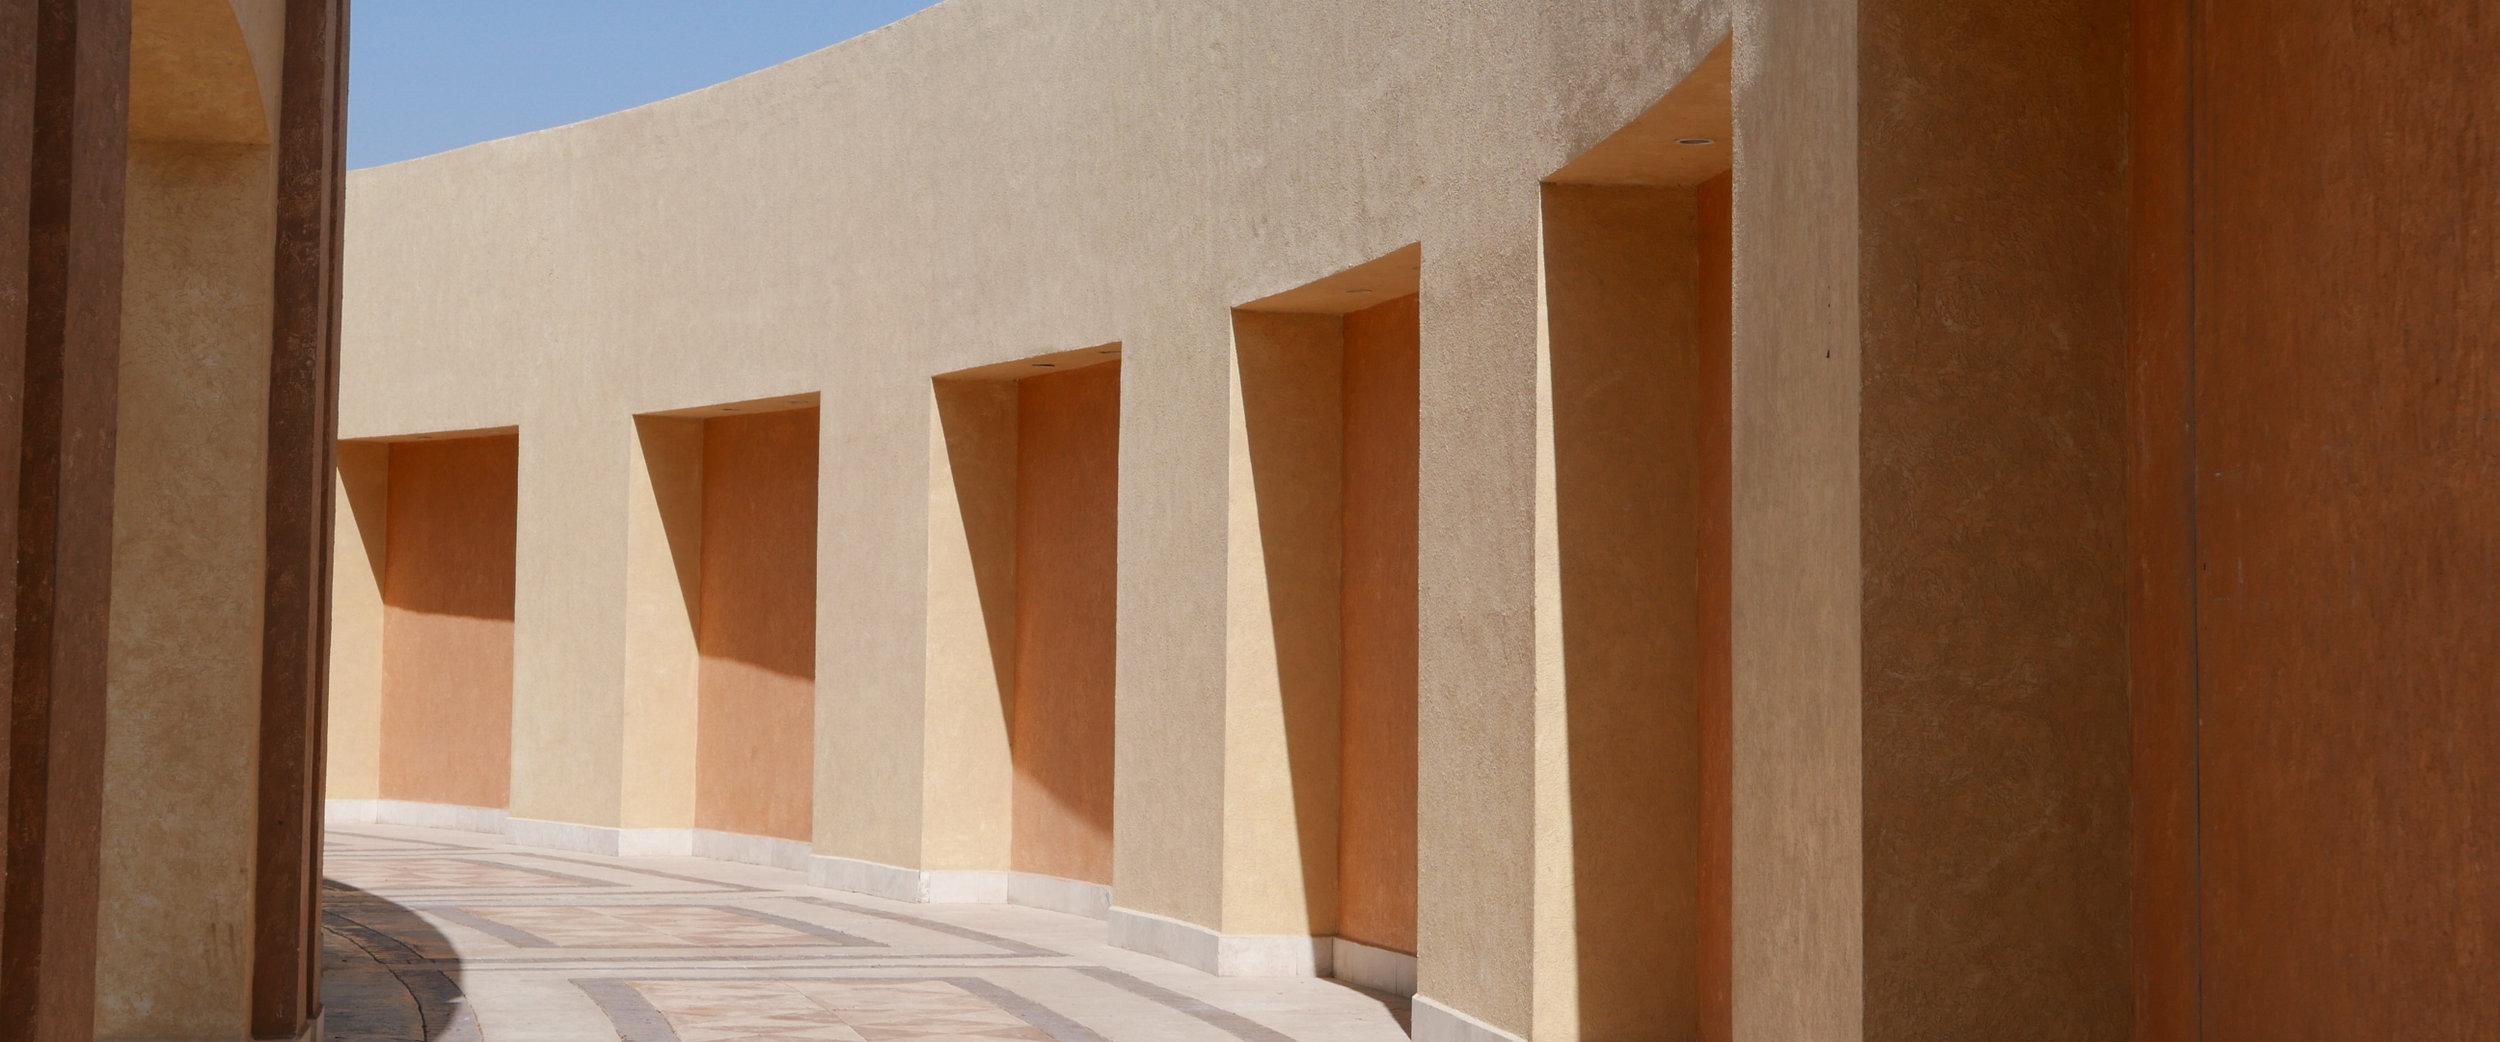 cabo-san-lucas-orange-walkway.jpg